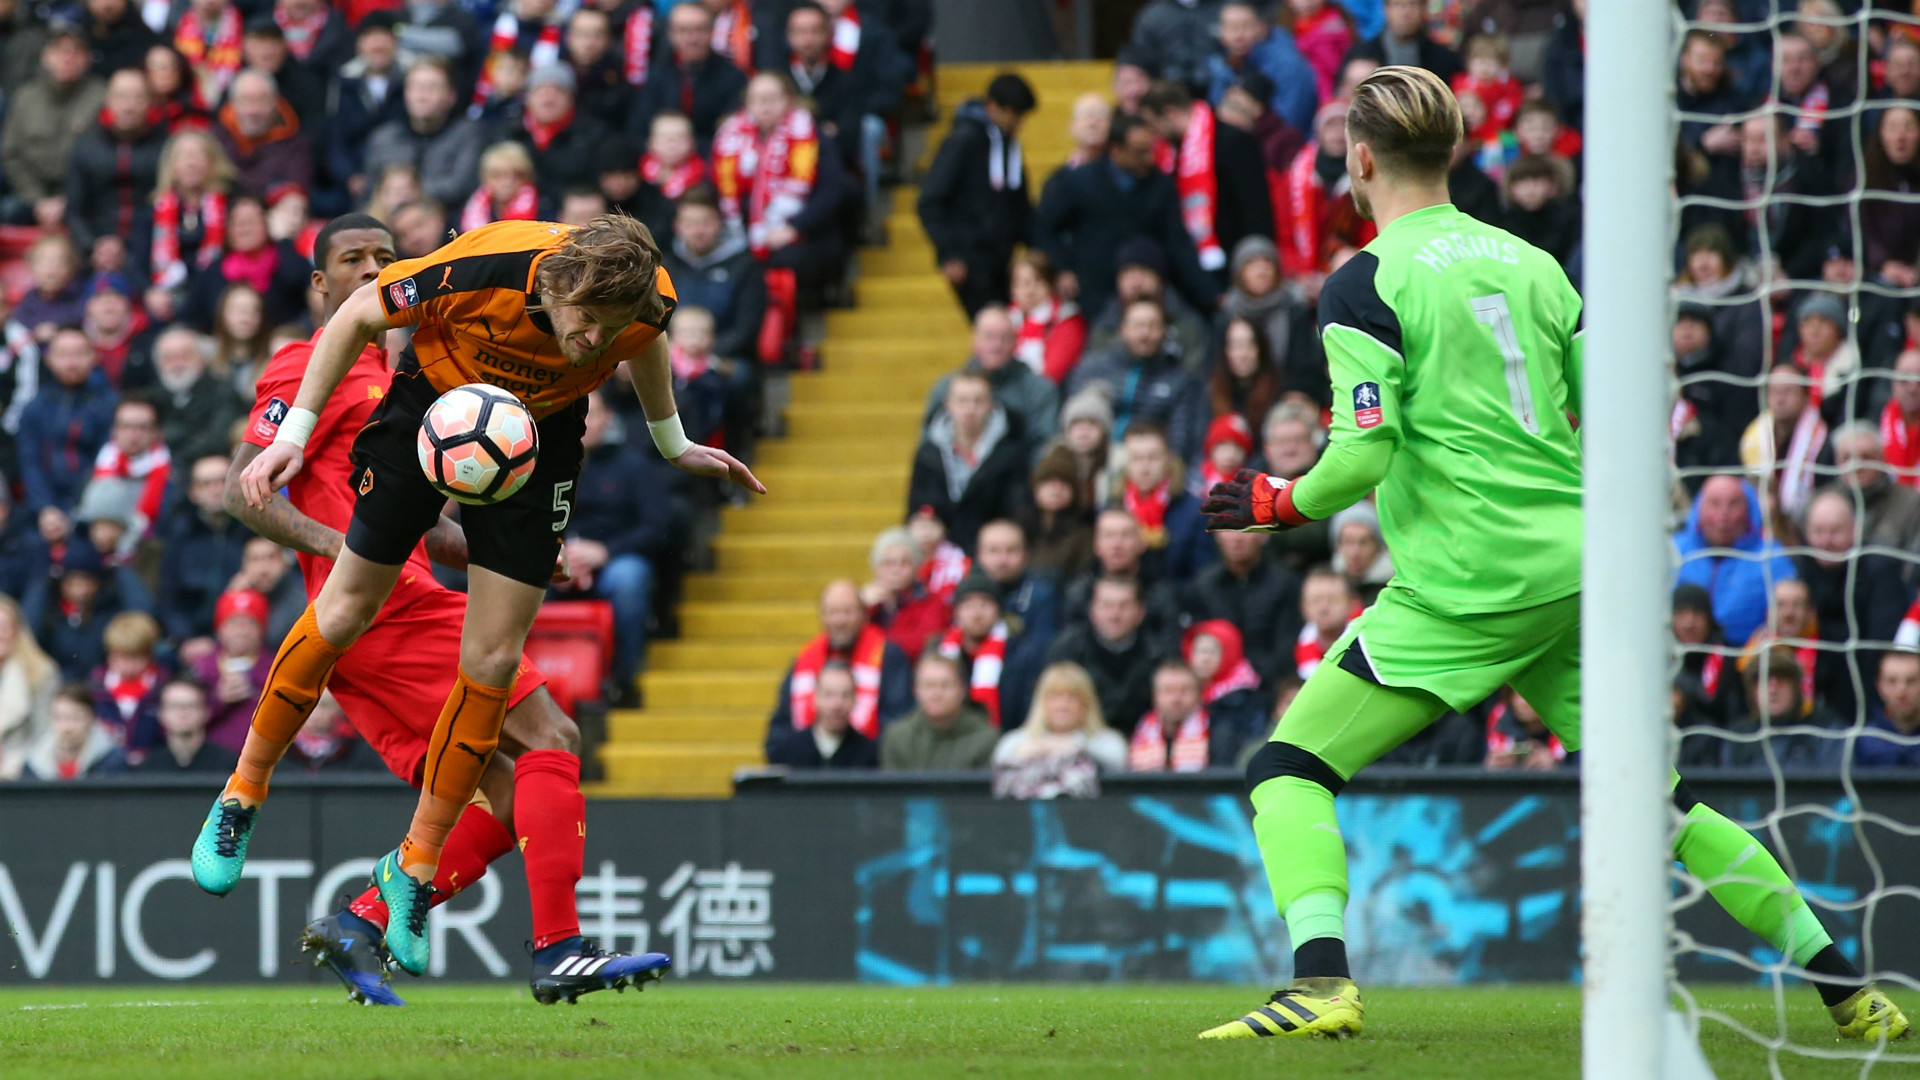 HD Richard Stearman scores v Liverpool